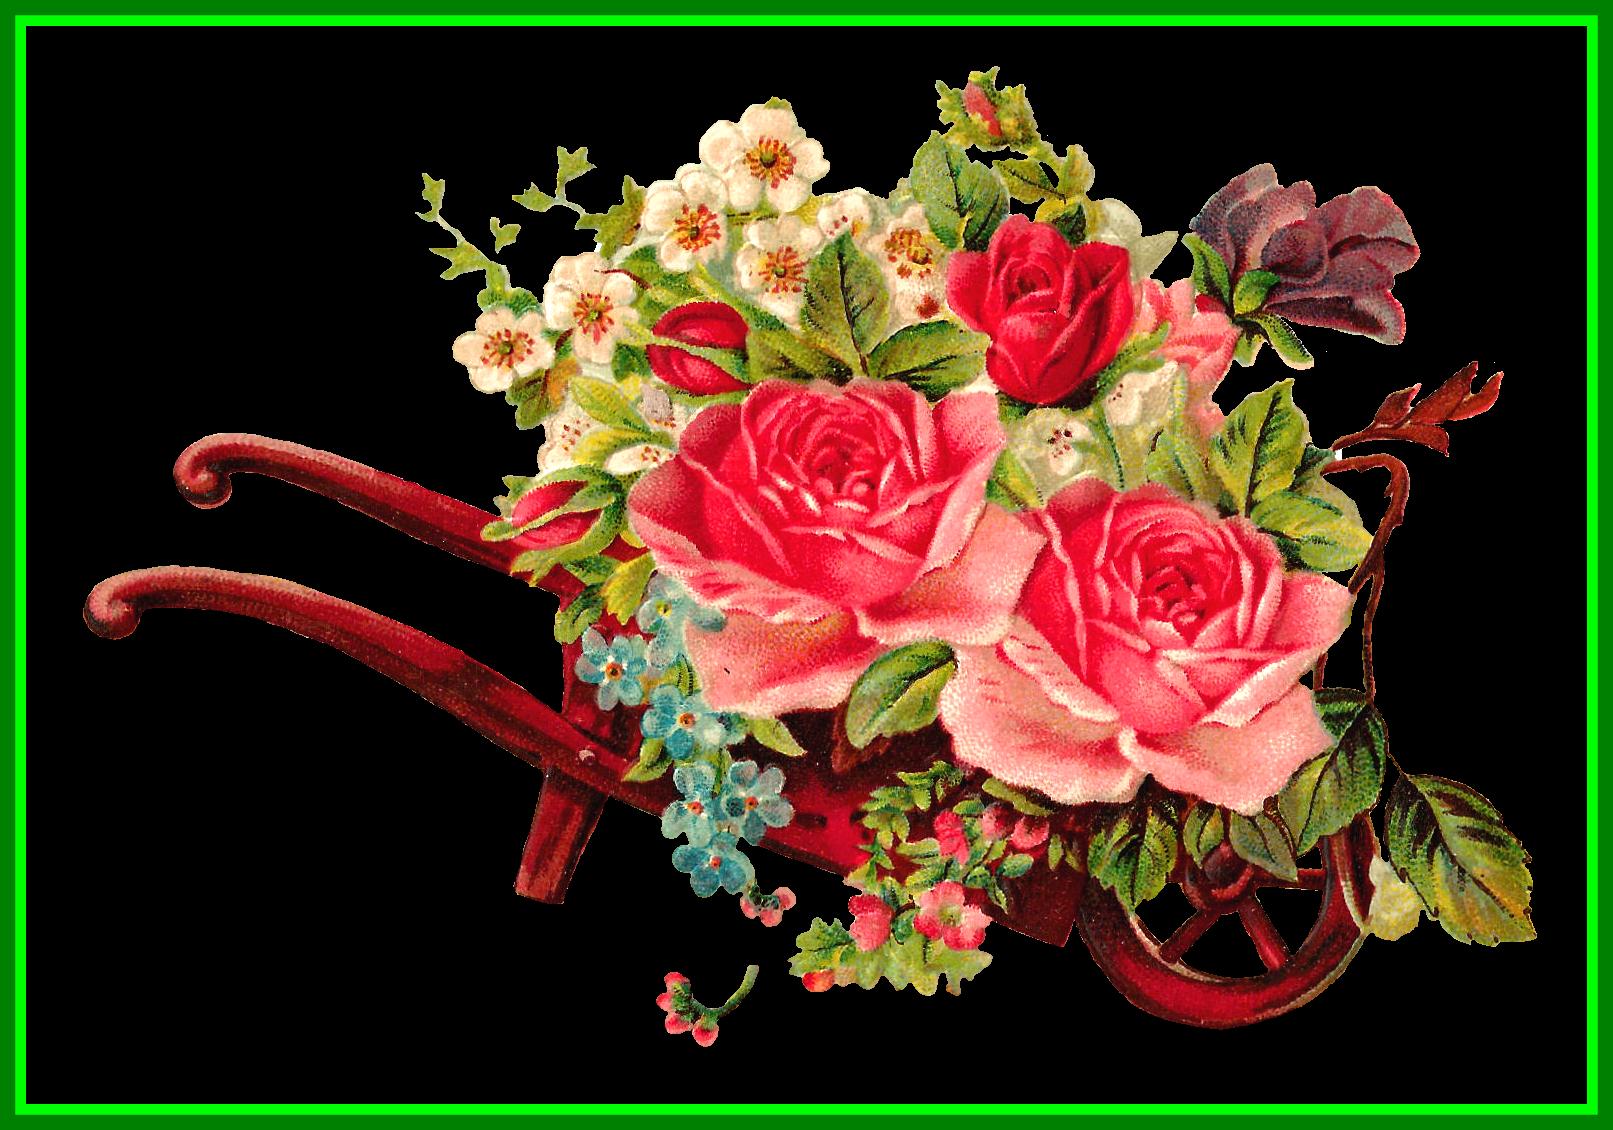 Digital flower clipart clip royalty free stock Awesome Pennino Vintage Pink Fuchsia Rhodium Plated Rhinestone ... clip royalty free stock